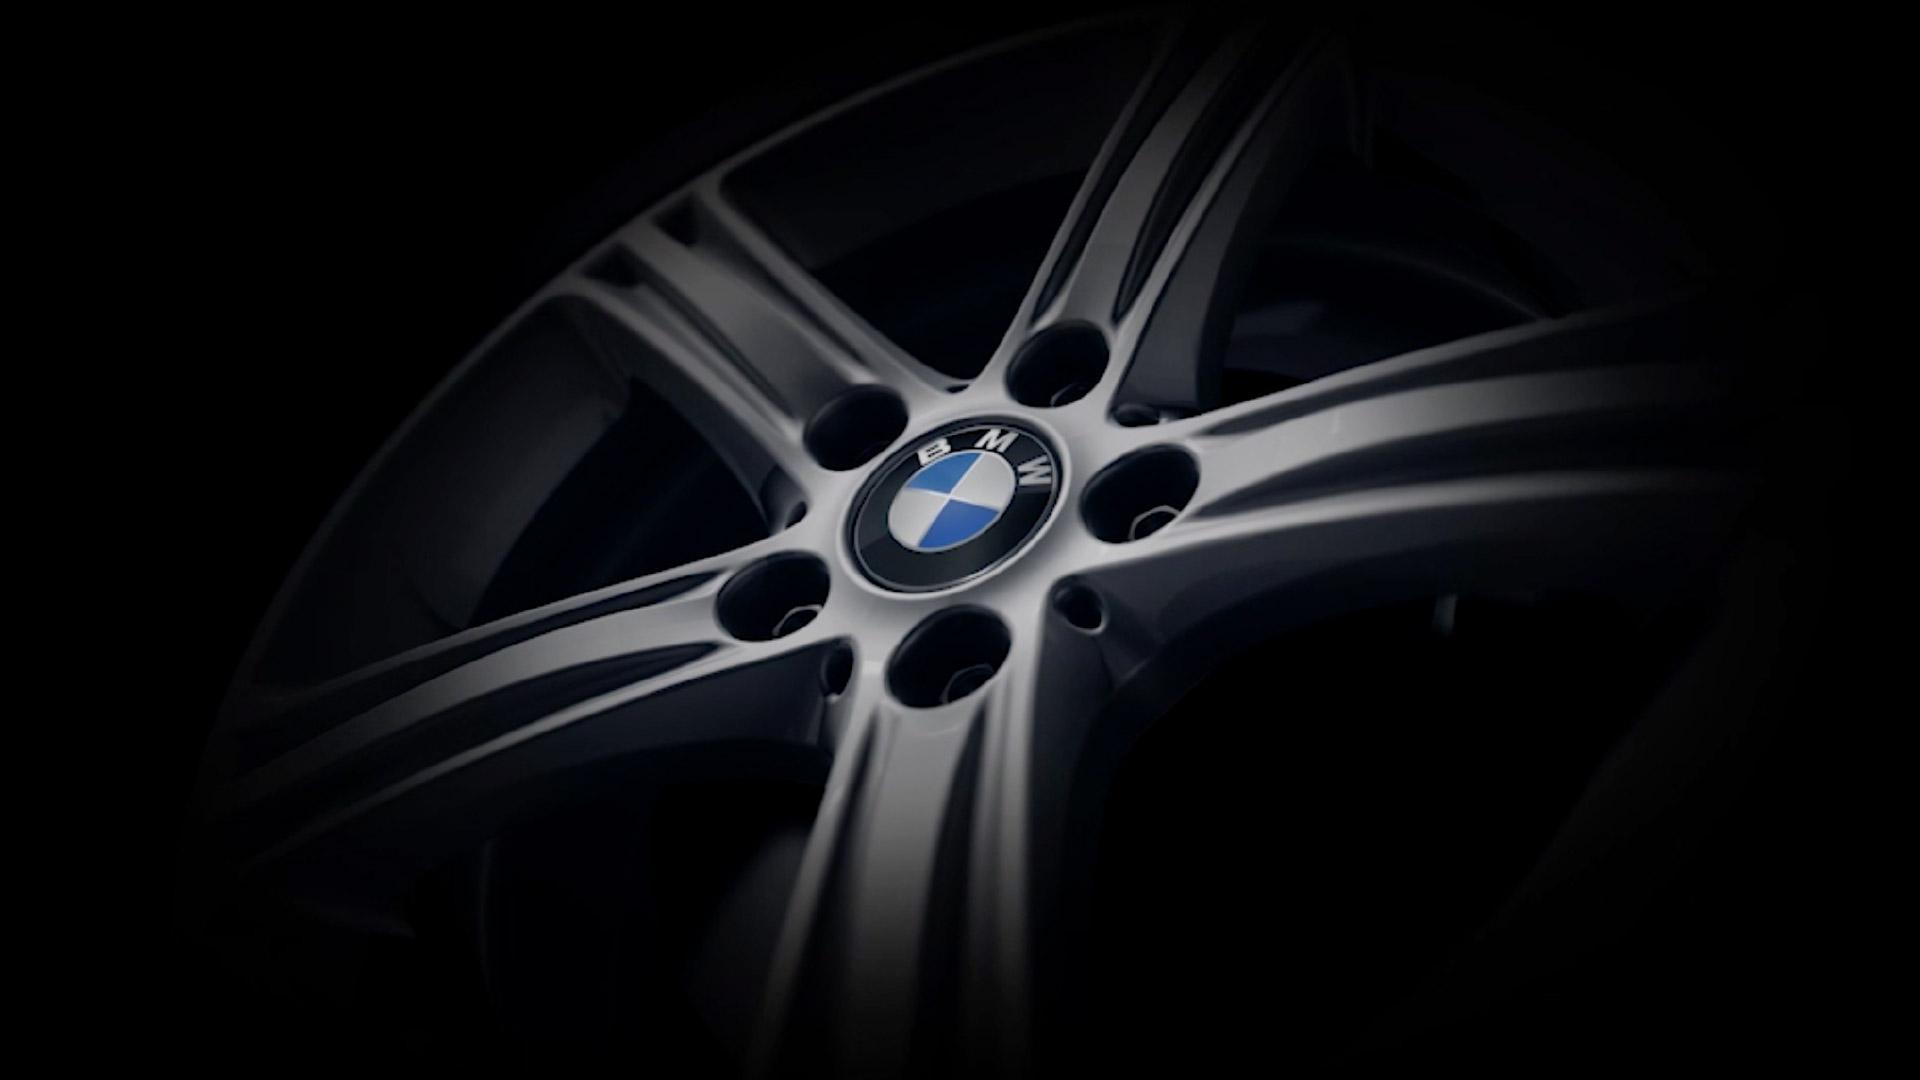 BMW-Poster-Frame.jpg